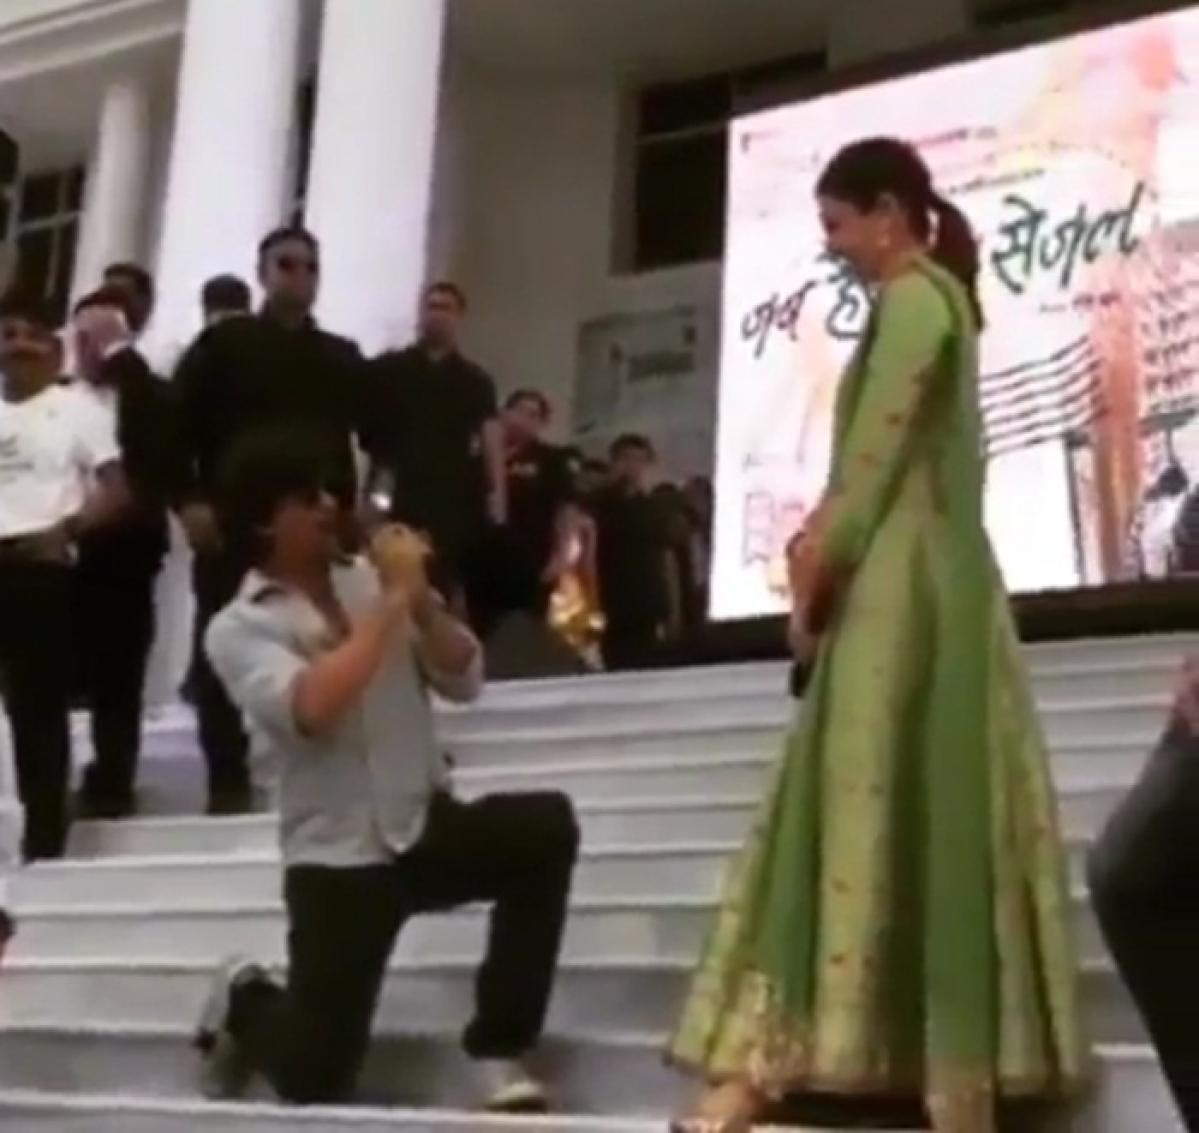 Dont miss 'Jab Harry Met Sejal' in Varanasi: Shah Rukh sing Bhojpurisong 'Lollypop Lagelu' for Anushka